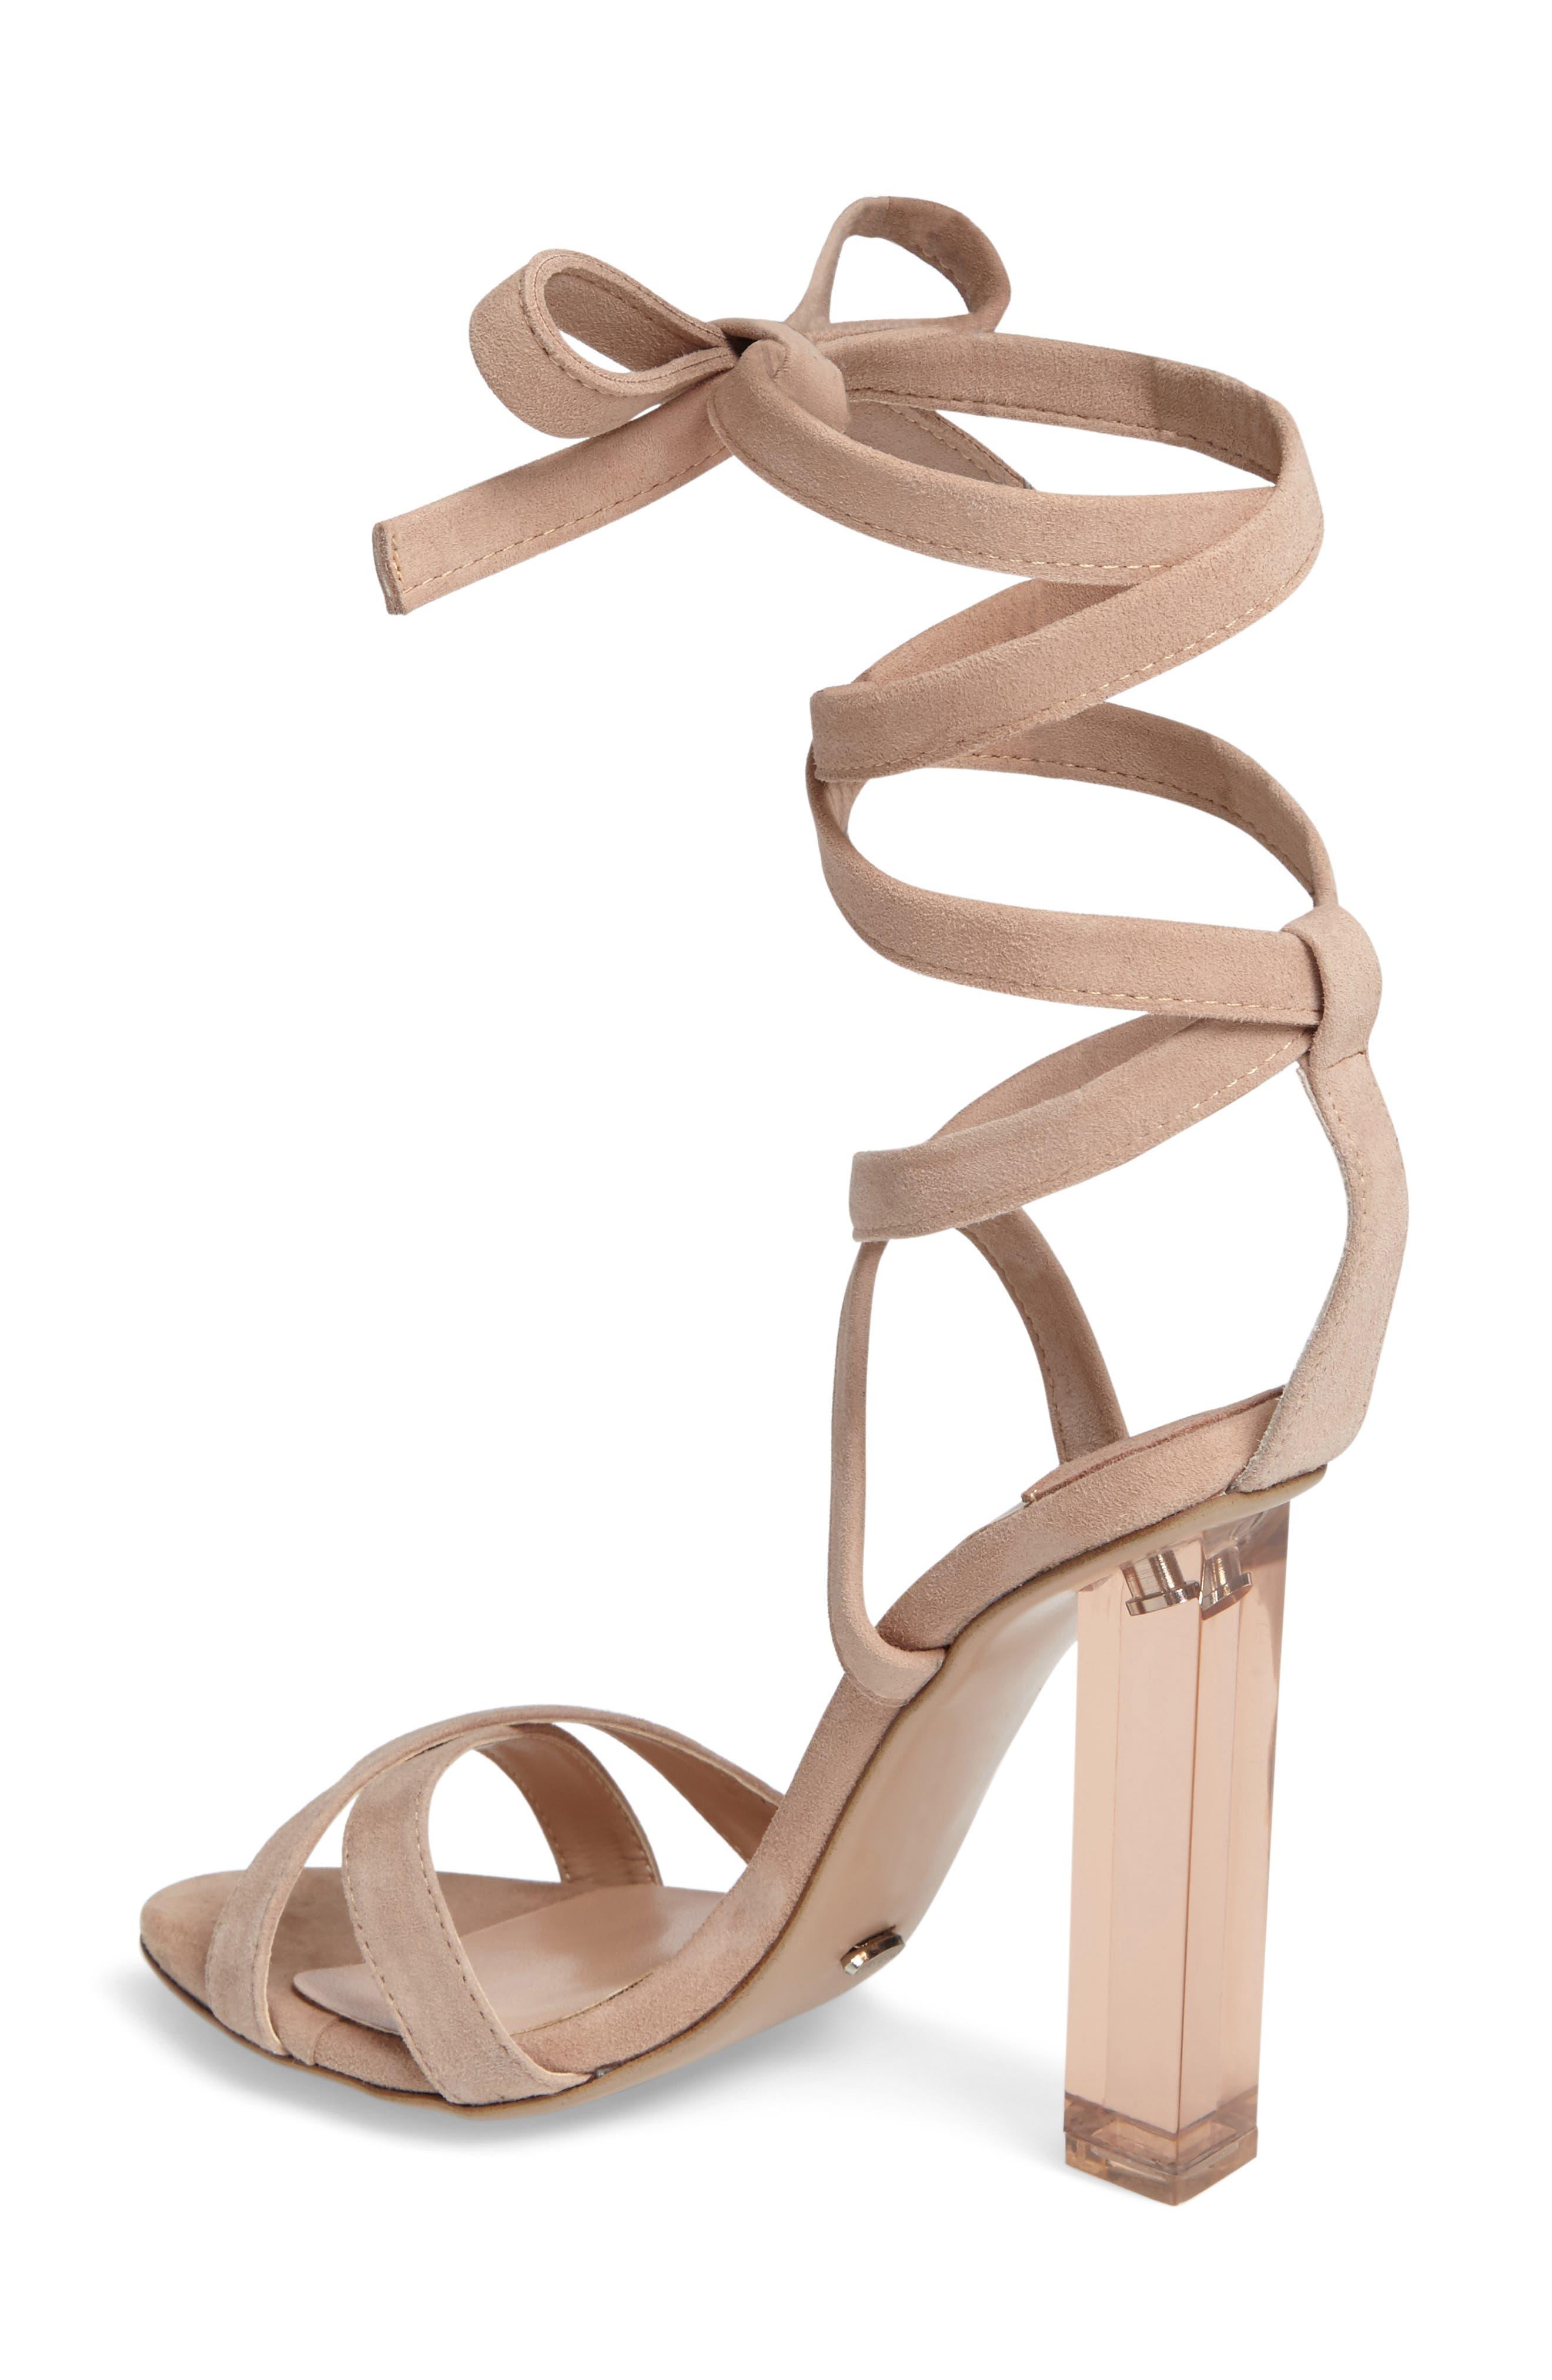 Komma Translucent Heel Sandal,                             Alternate thumbnail 4, color,